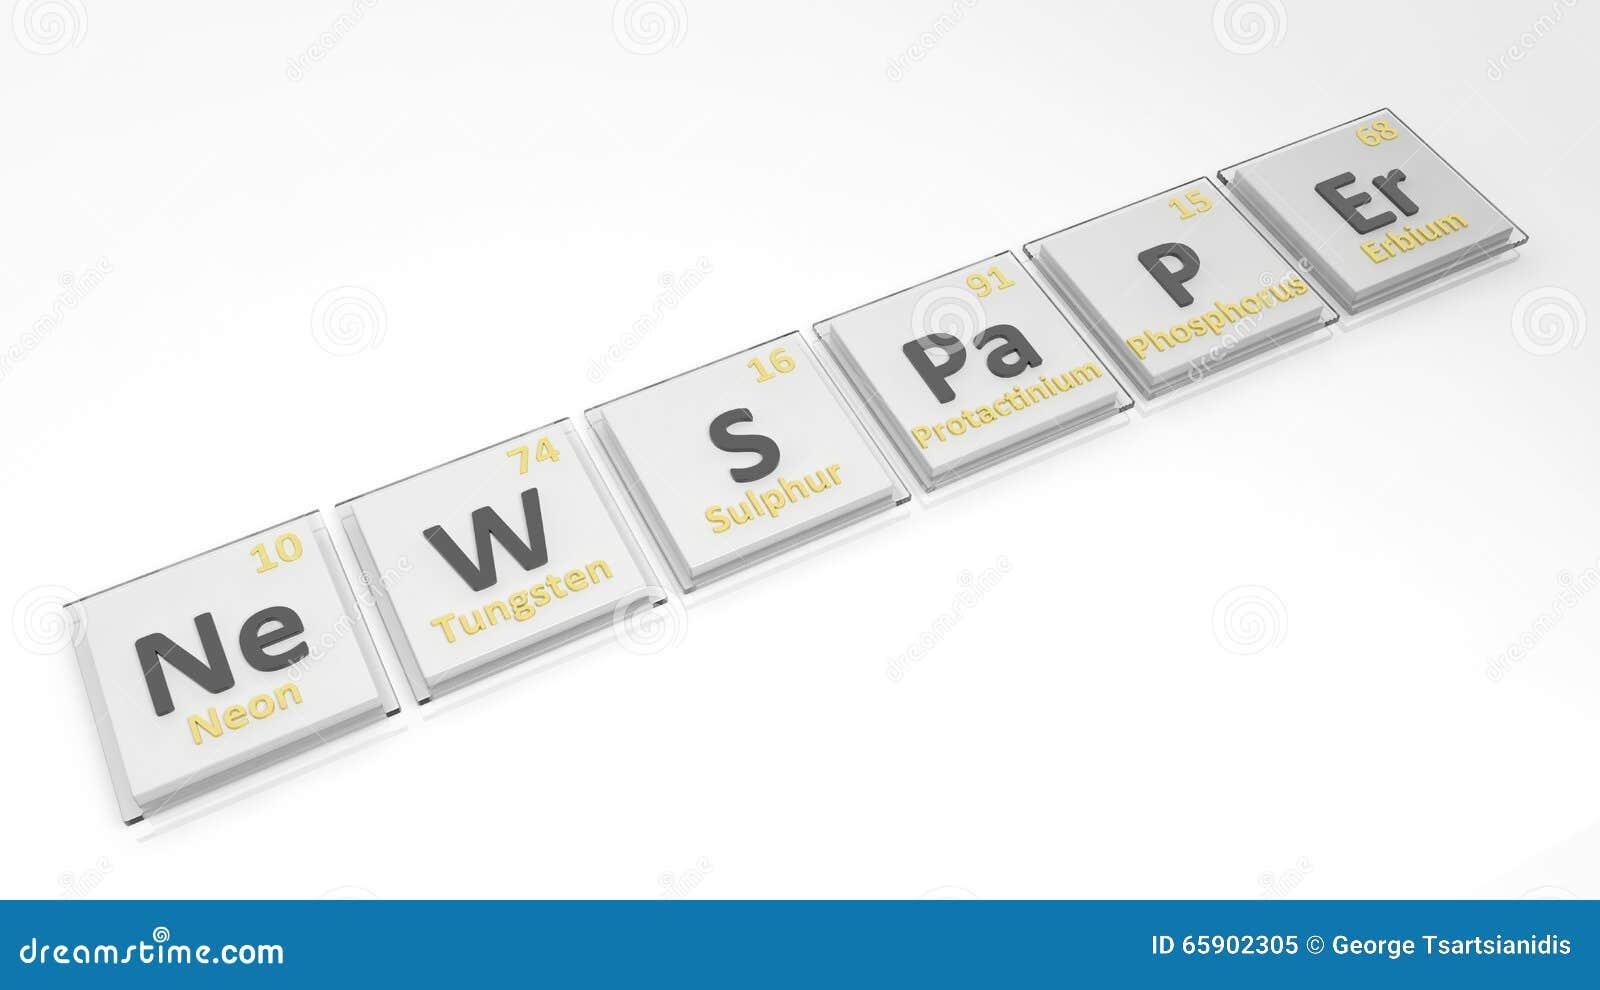 Periodic table of elements symbols stock illustration illustration download periodic table of elements symbols stock illustration illustration of text chemistry 65902305 urtaz Gallery